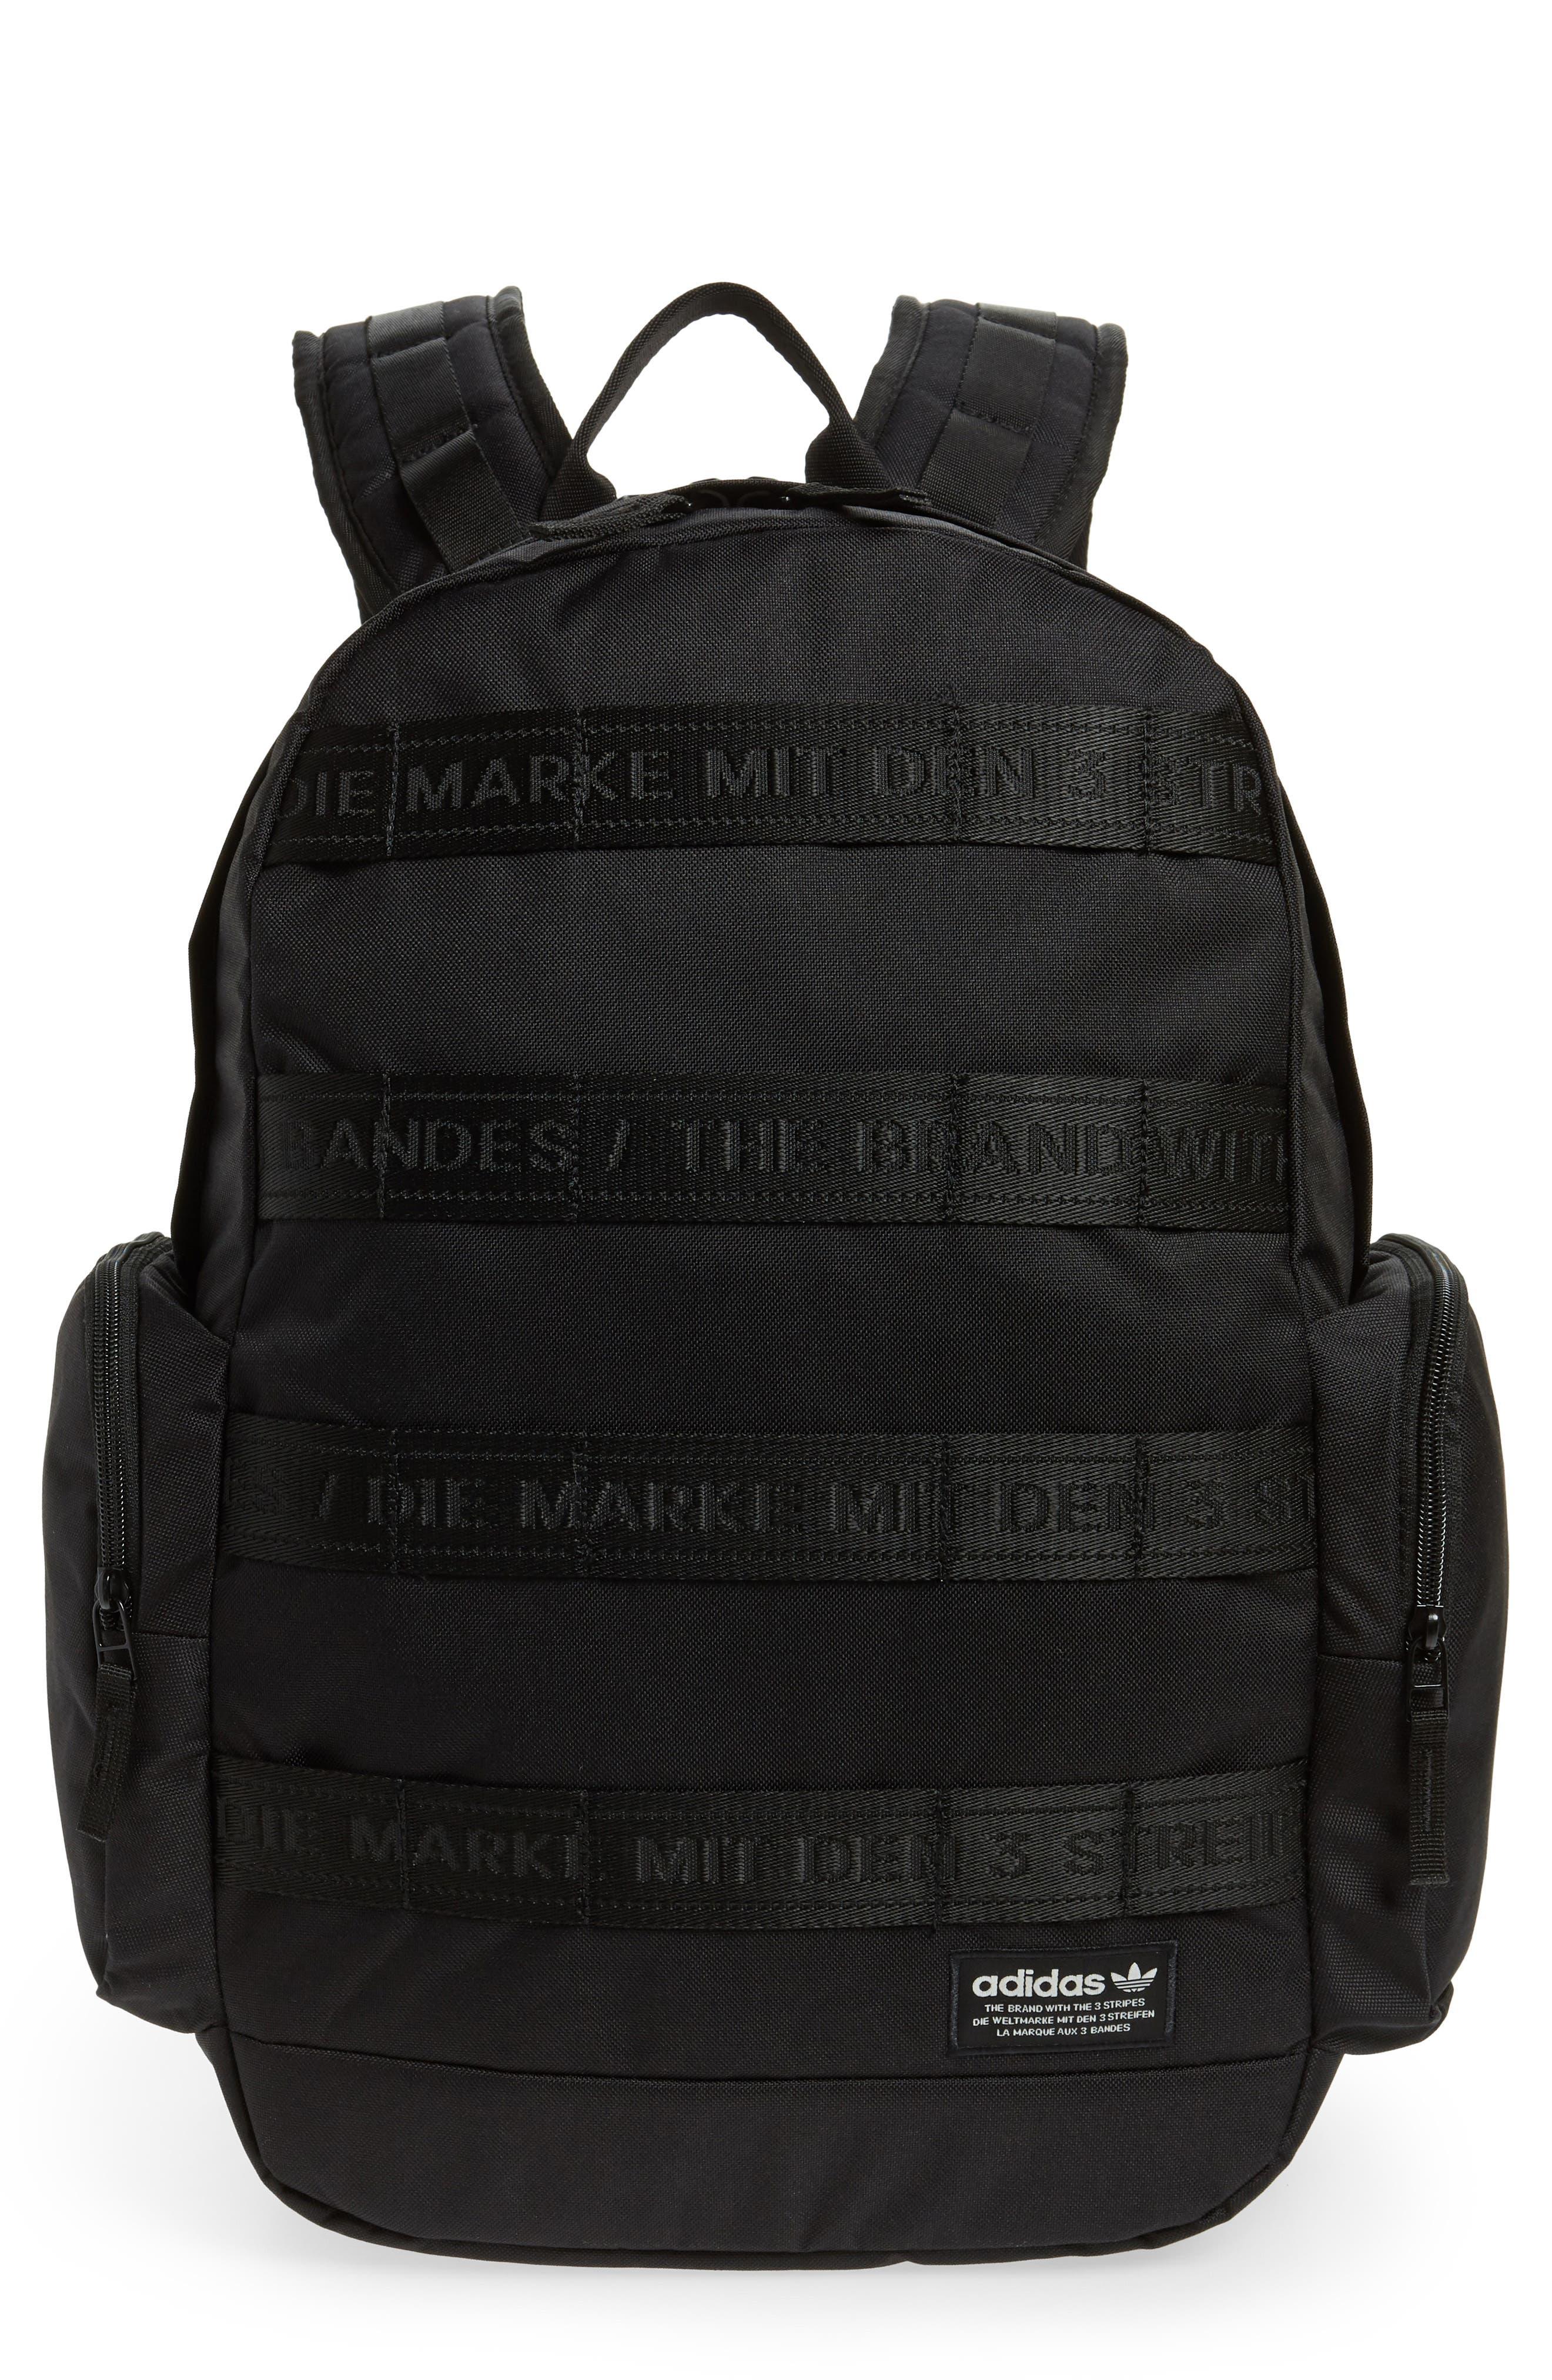 Create III Backpack,                             Main thumbnail 1, color,                             BLACK/ RAW DESERT KHAKI